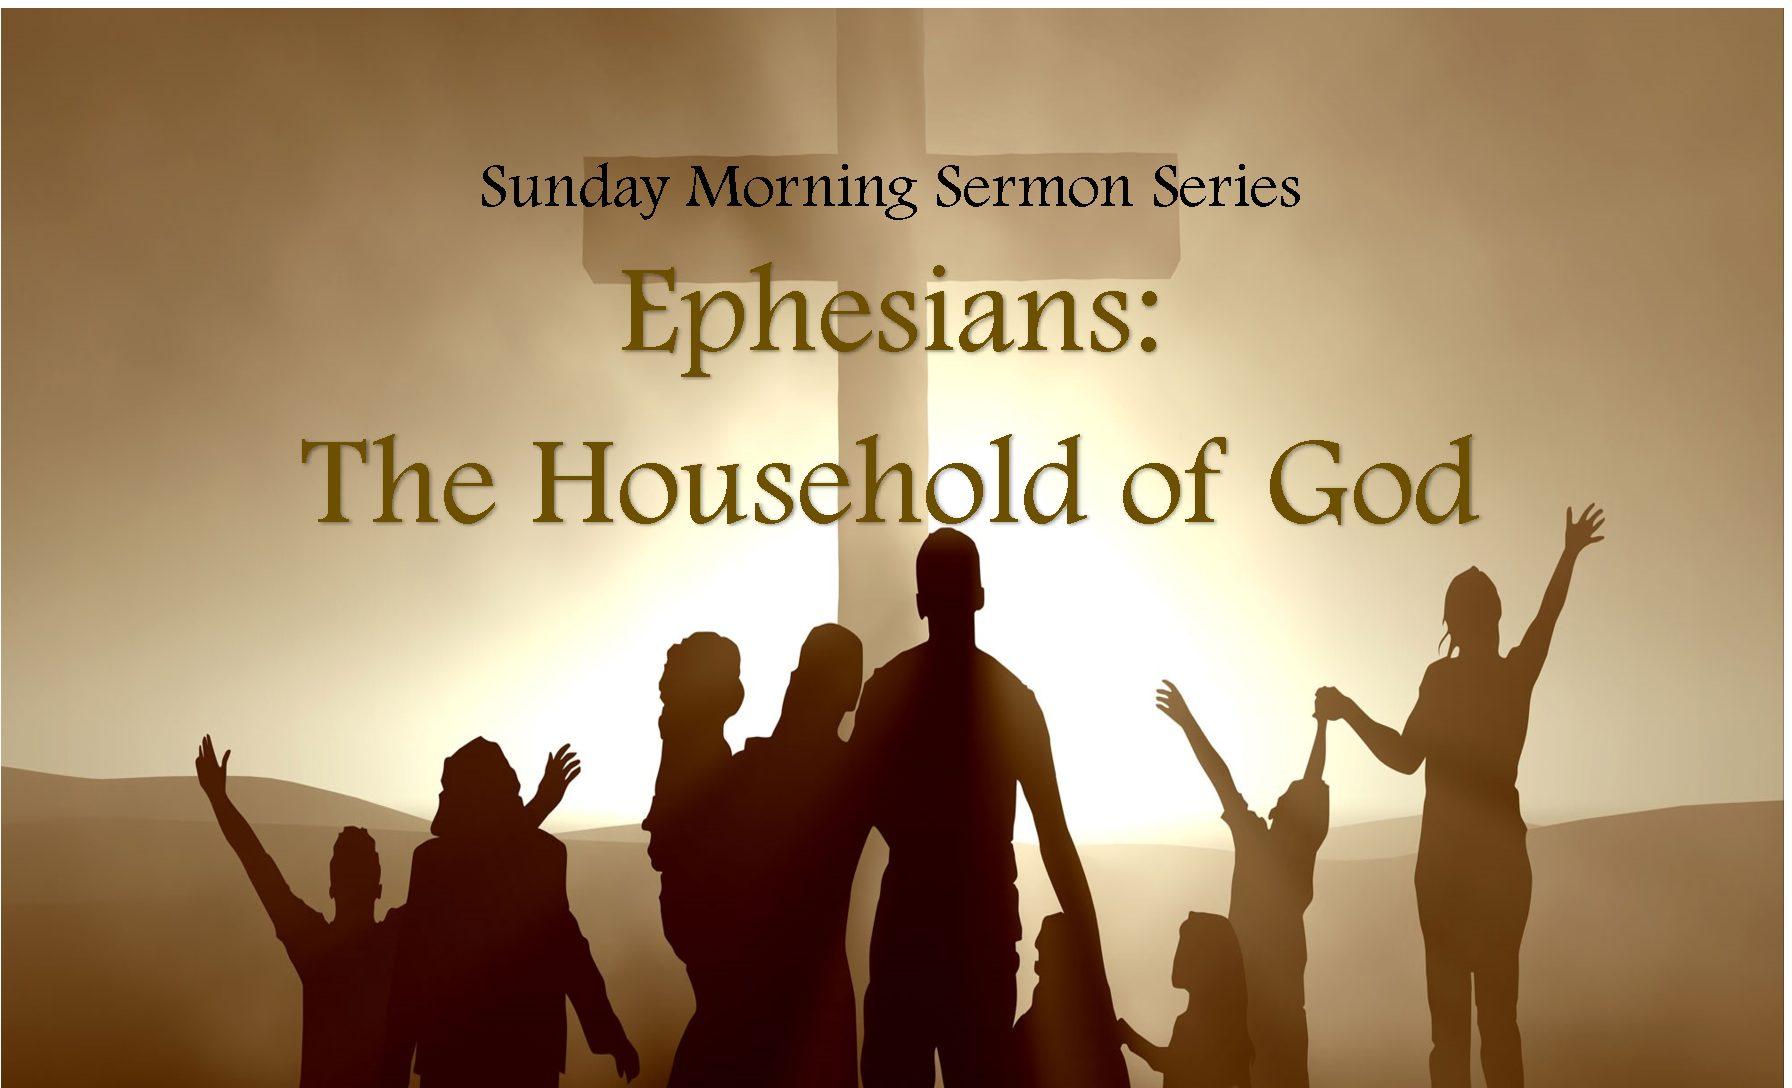 The Household of God: The Right Stuff for Gospel Ministry